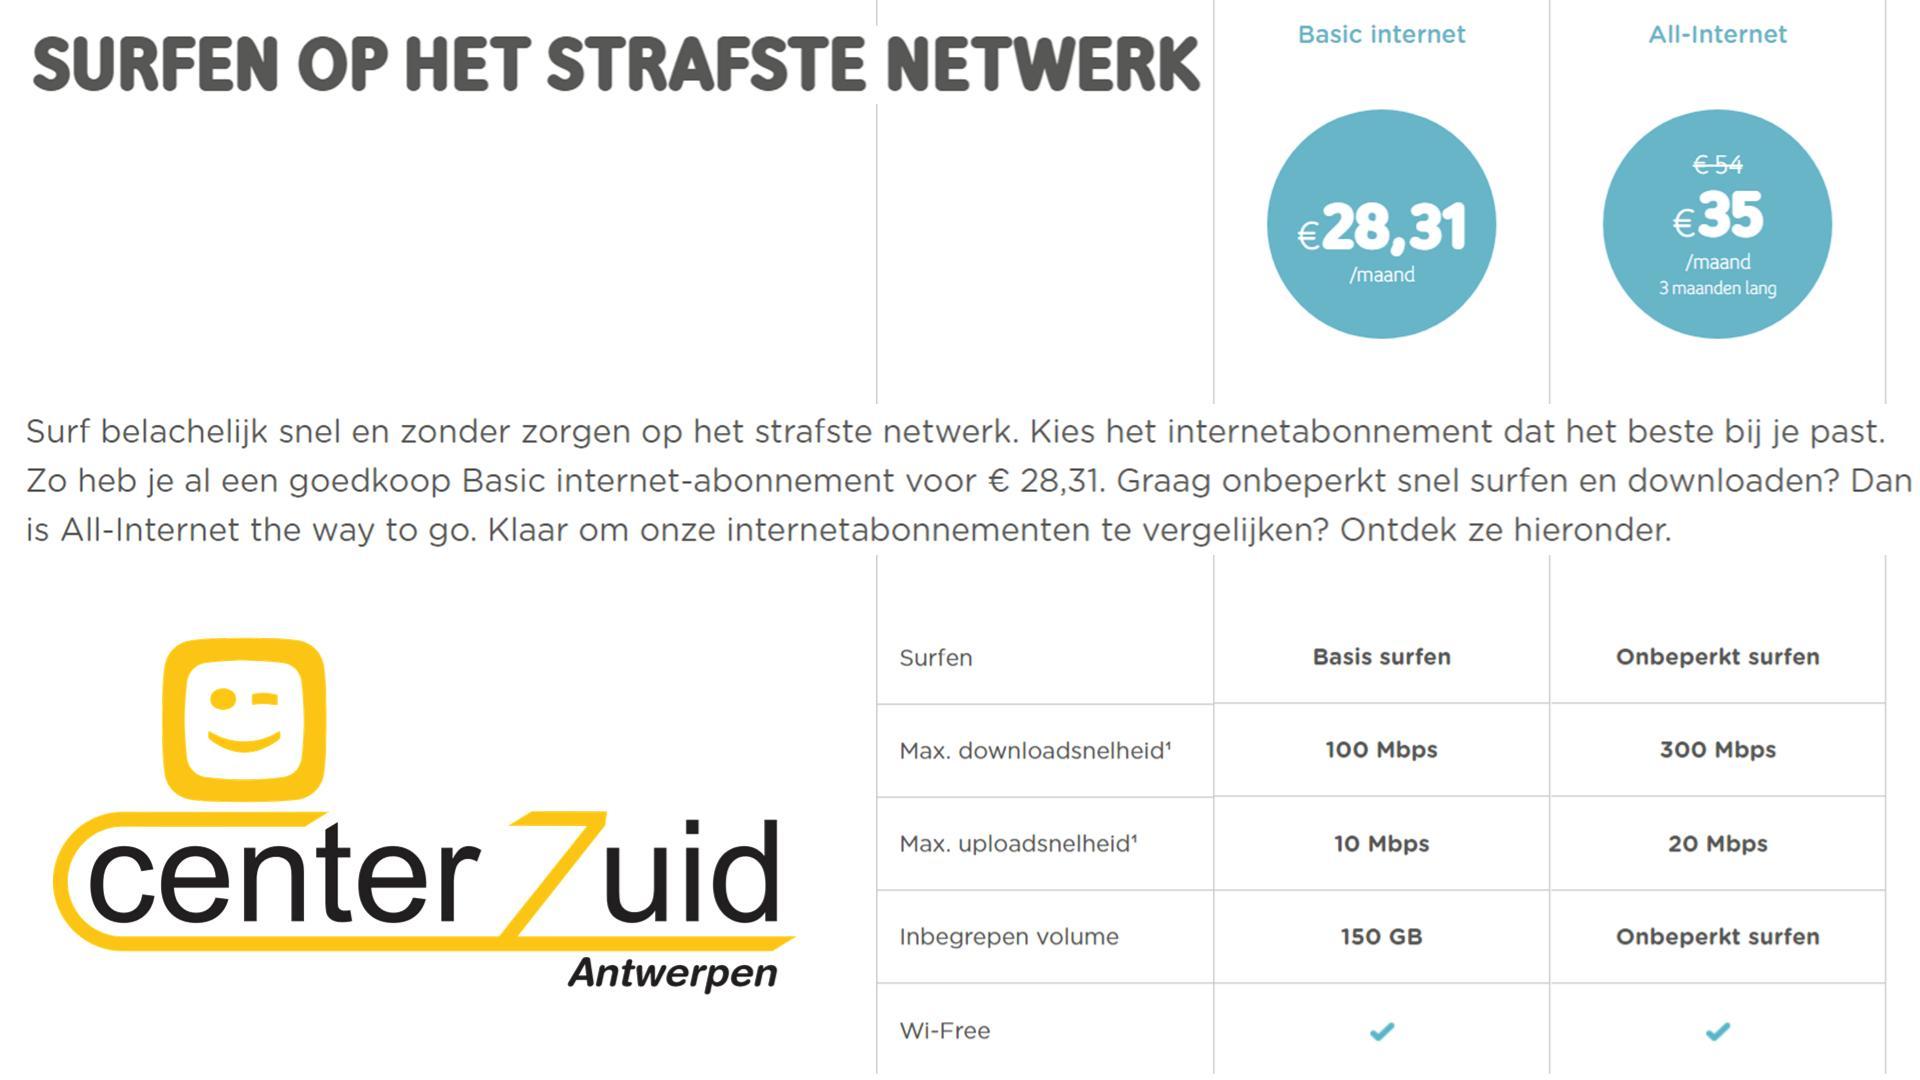 strafste - netwerk - telenet